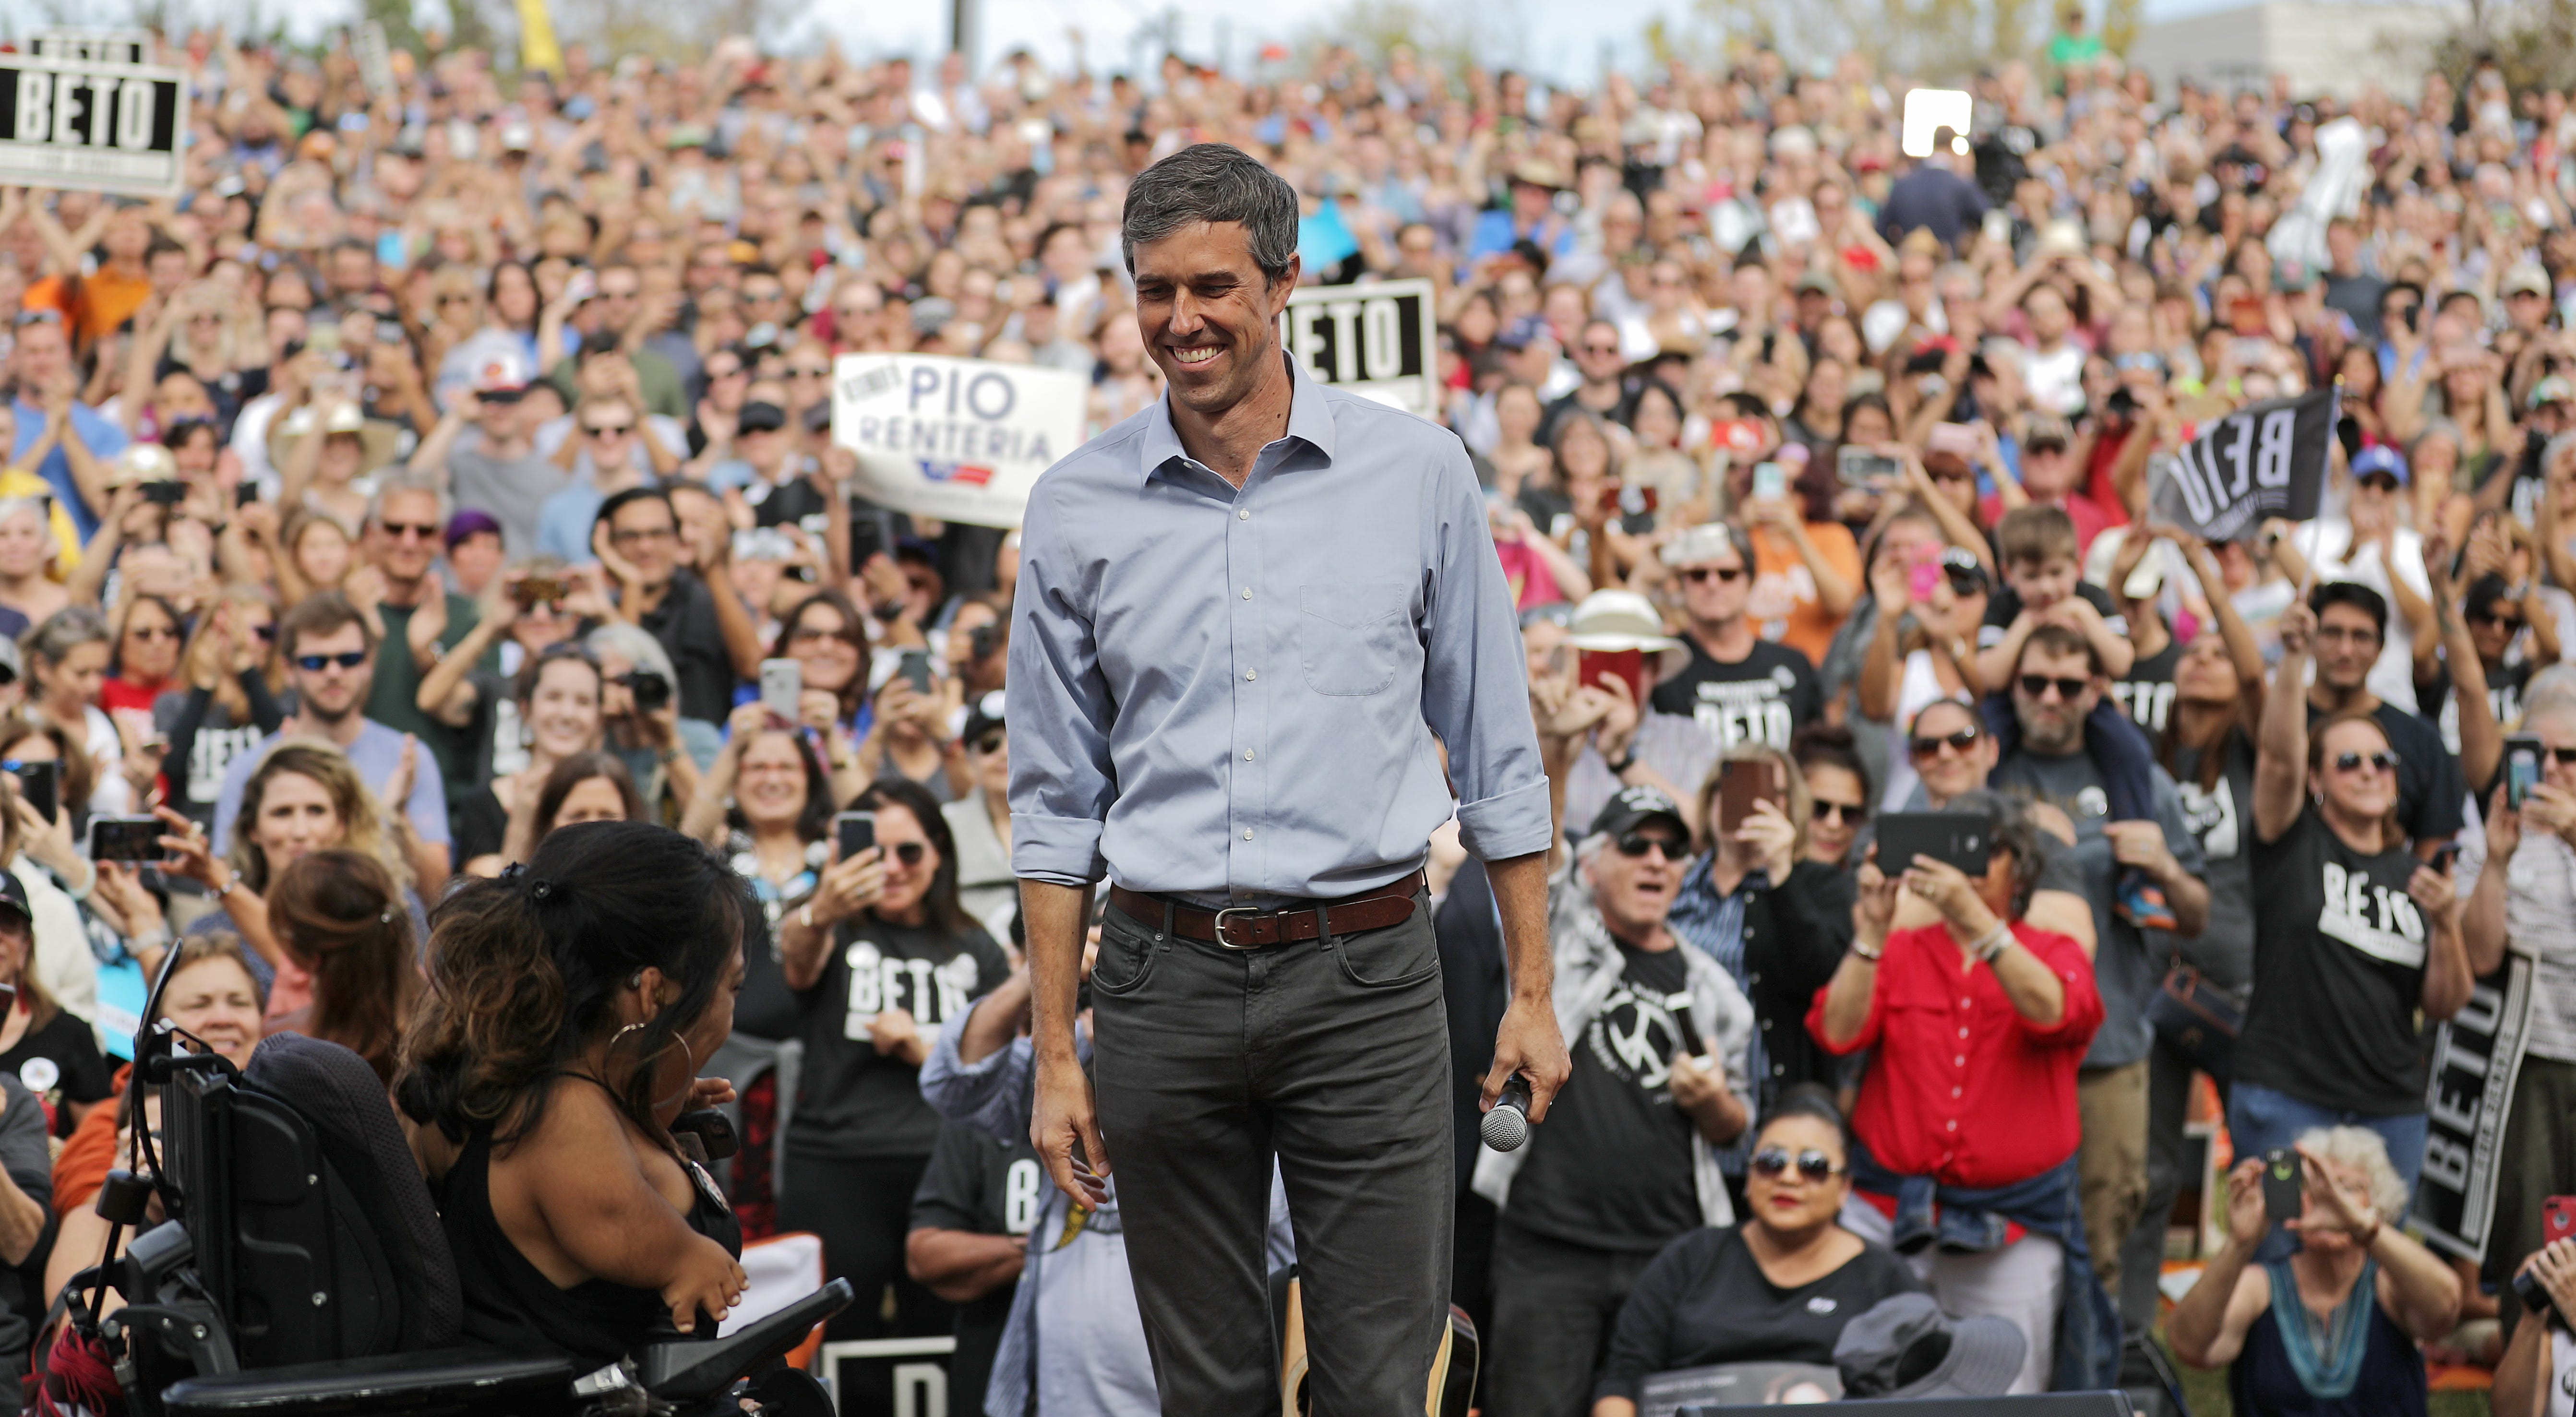 Texas Rep. Beto O'Rourke edges out Joe Biden to lead 2020 democratic field in MoveOn poll